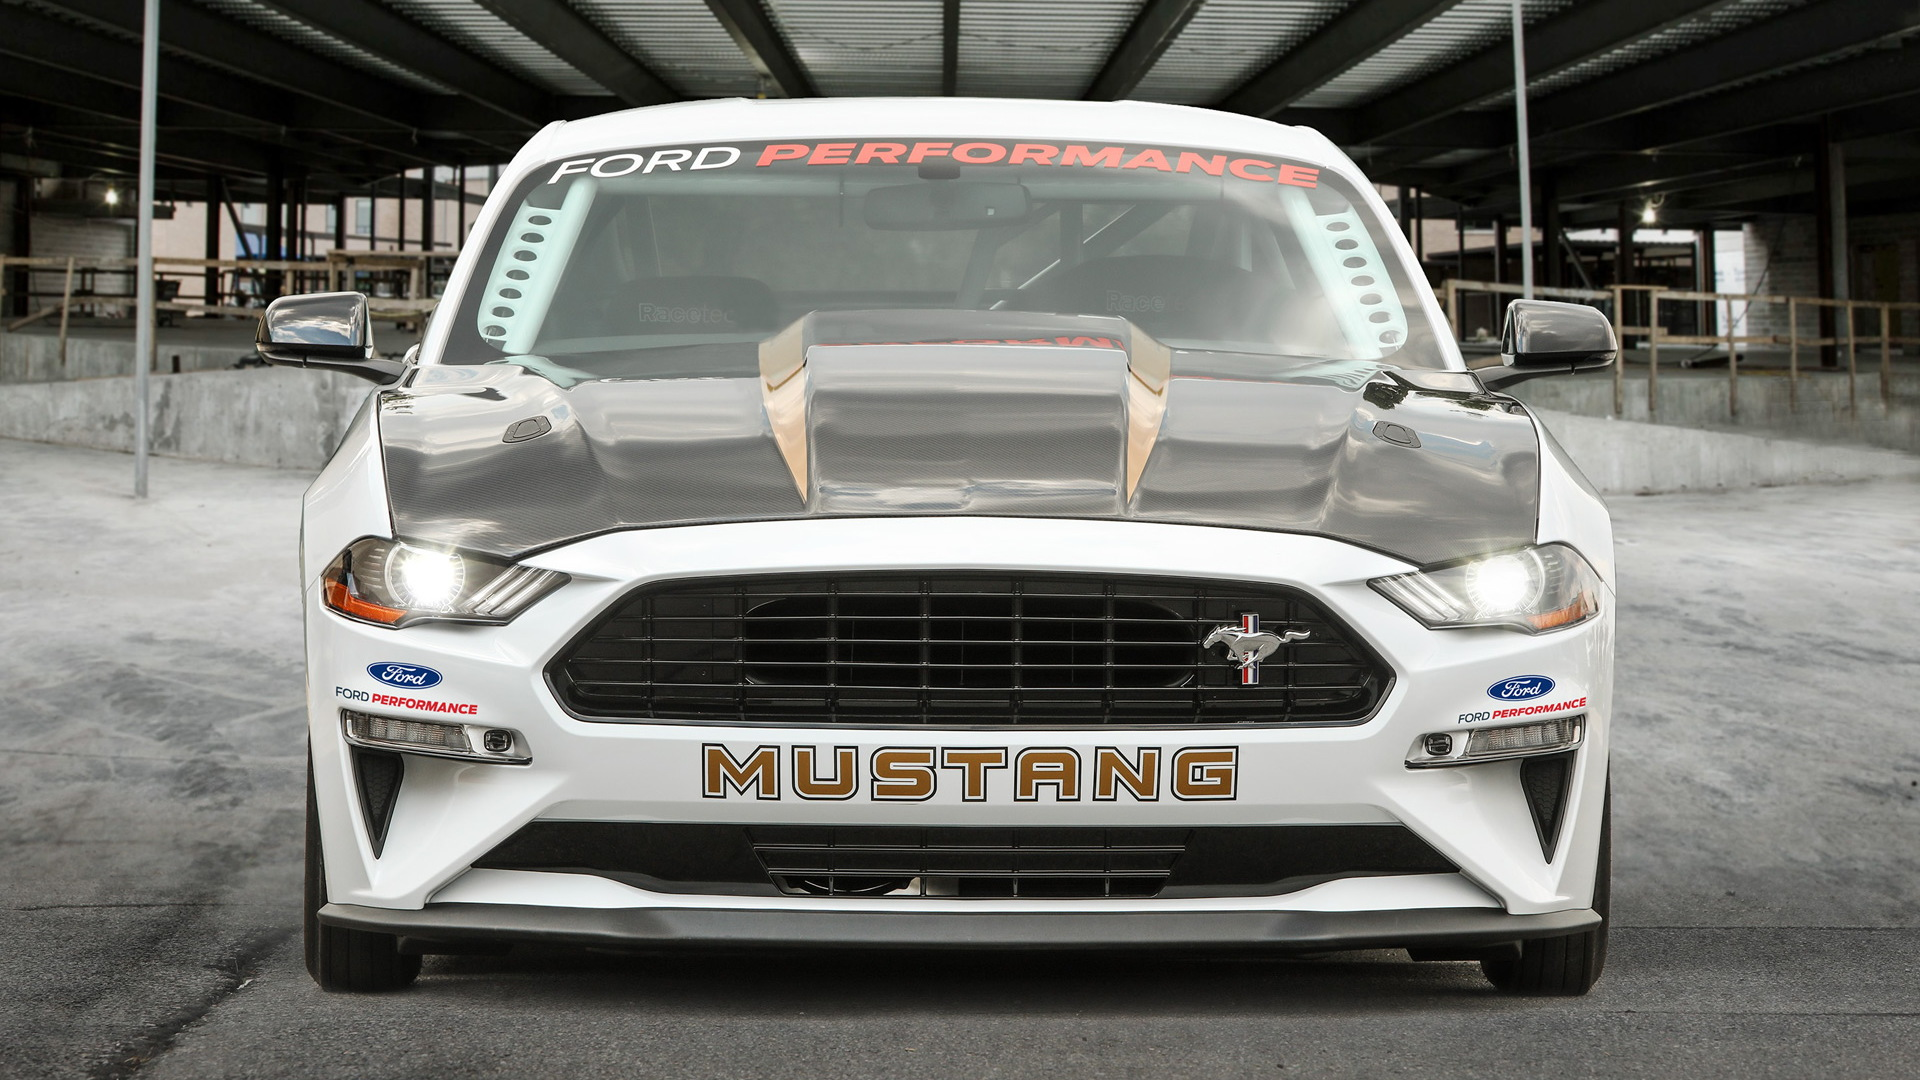 2018 Ford Mustang Cobra Jet drag race car